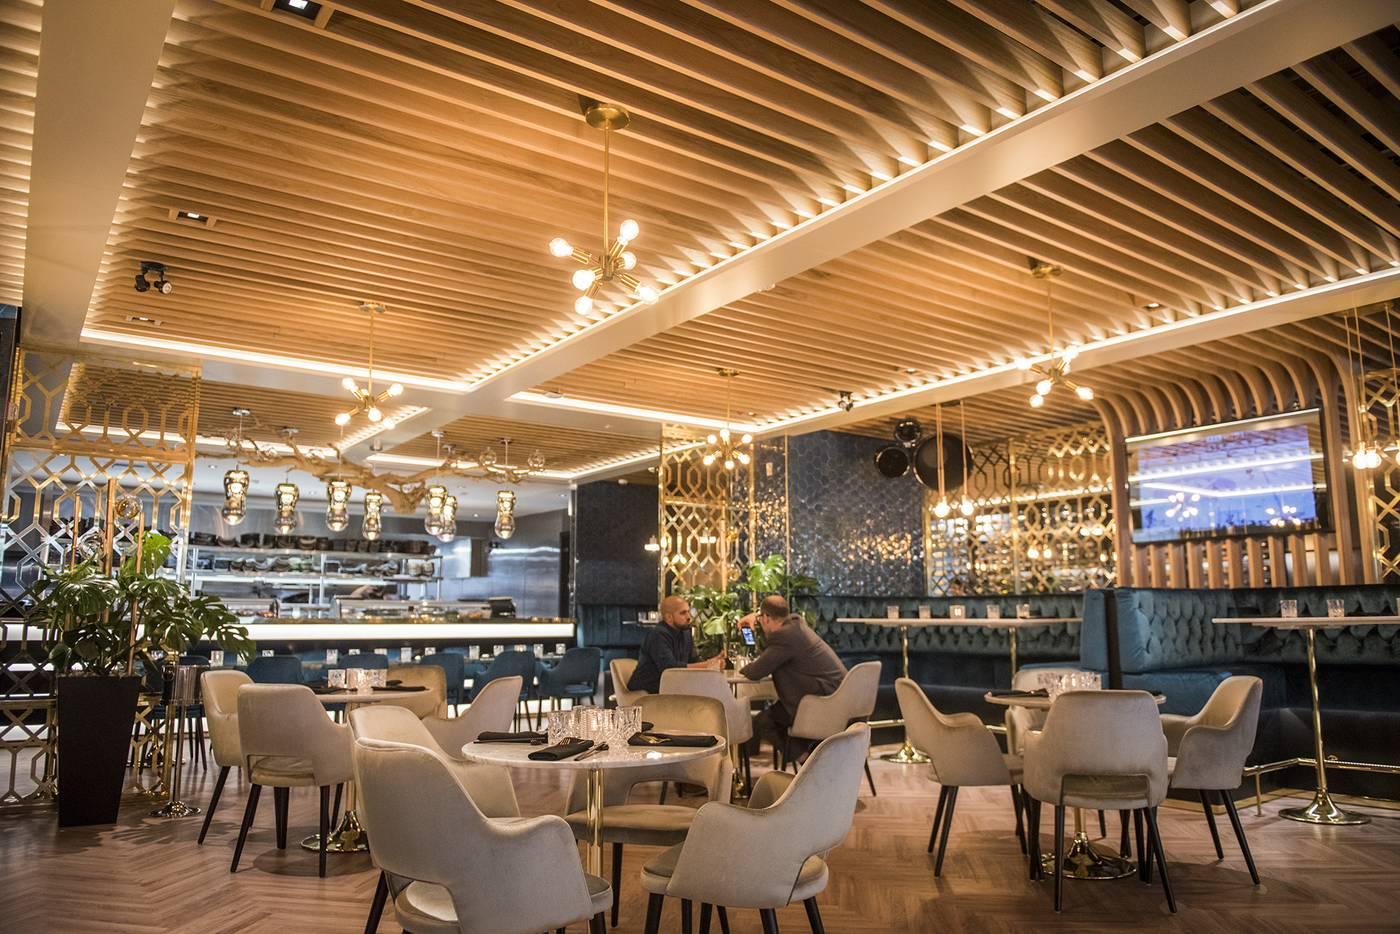 Restaurant Interieur Design.Drake S Pick 6ix Restaurant In Toronto Designed By Kroeze